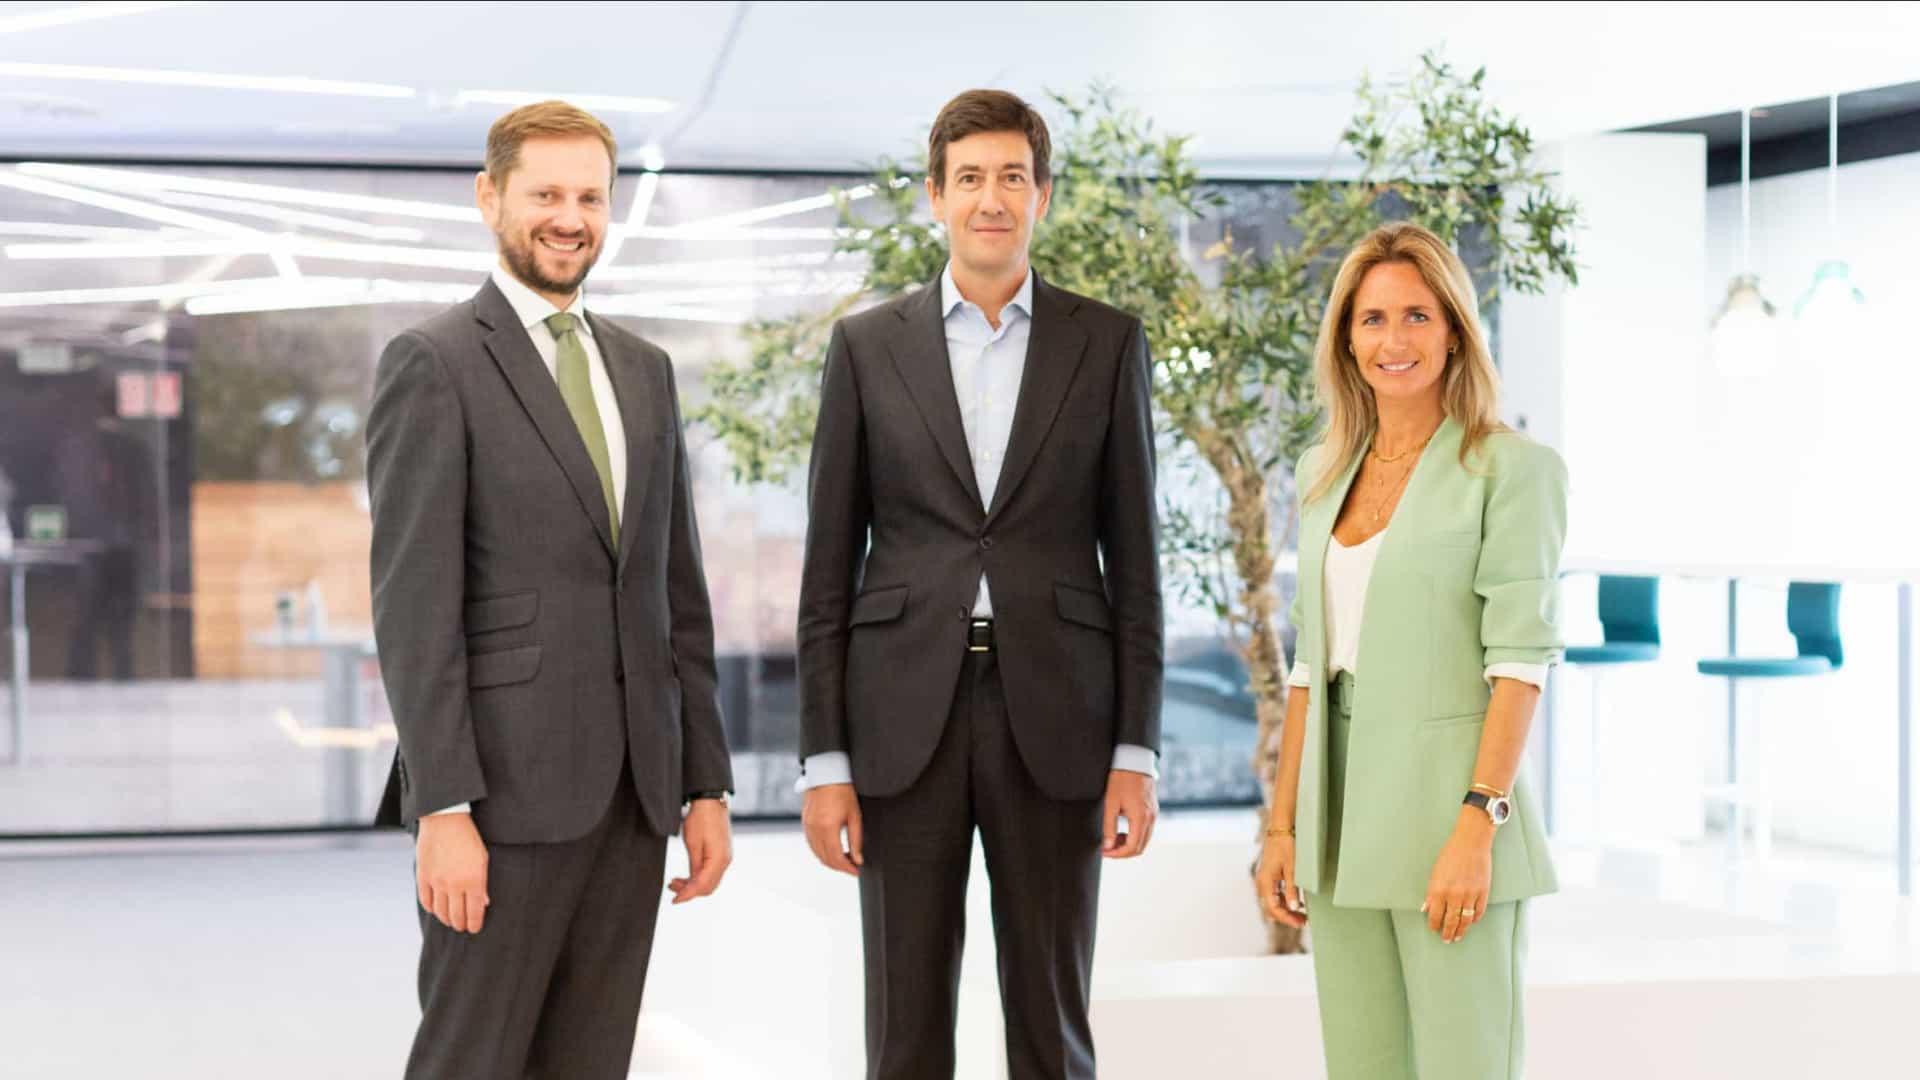 Sergio Fernandes da JLL, Álvaro Cobo da Gordon Brothers e Mariana Rosa da JLL.